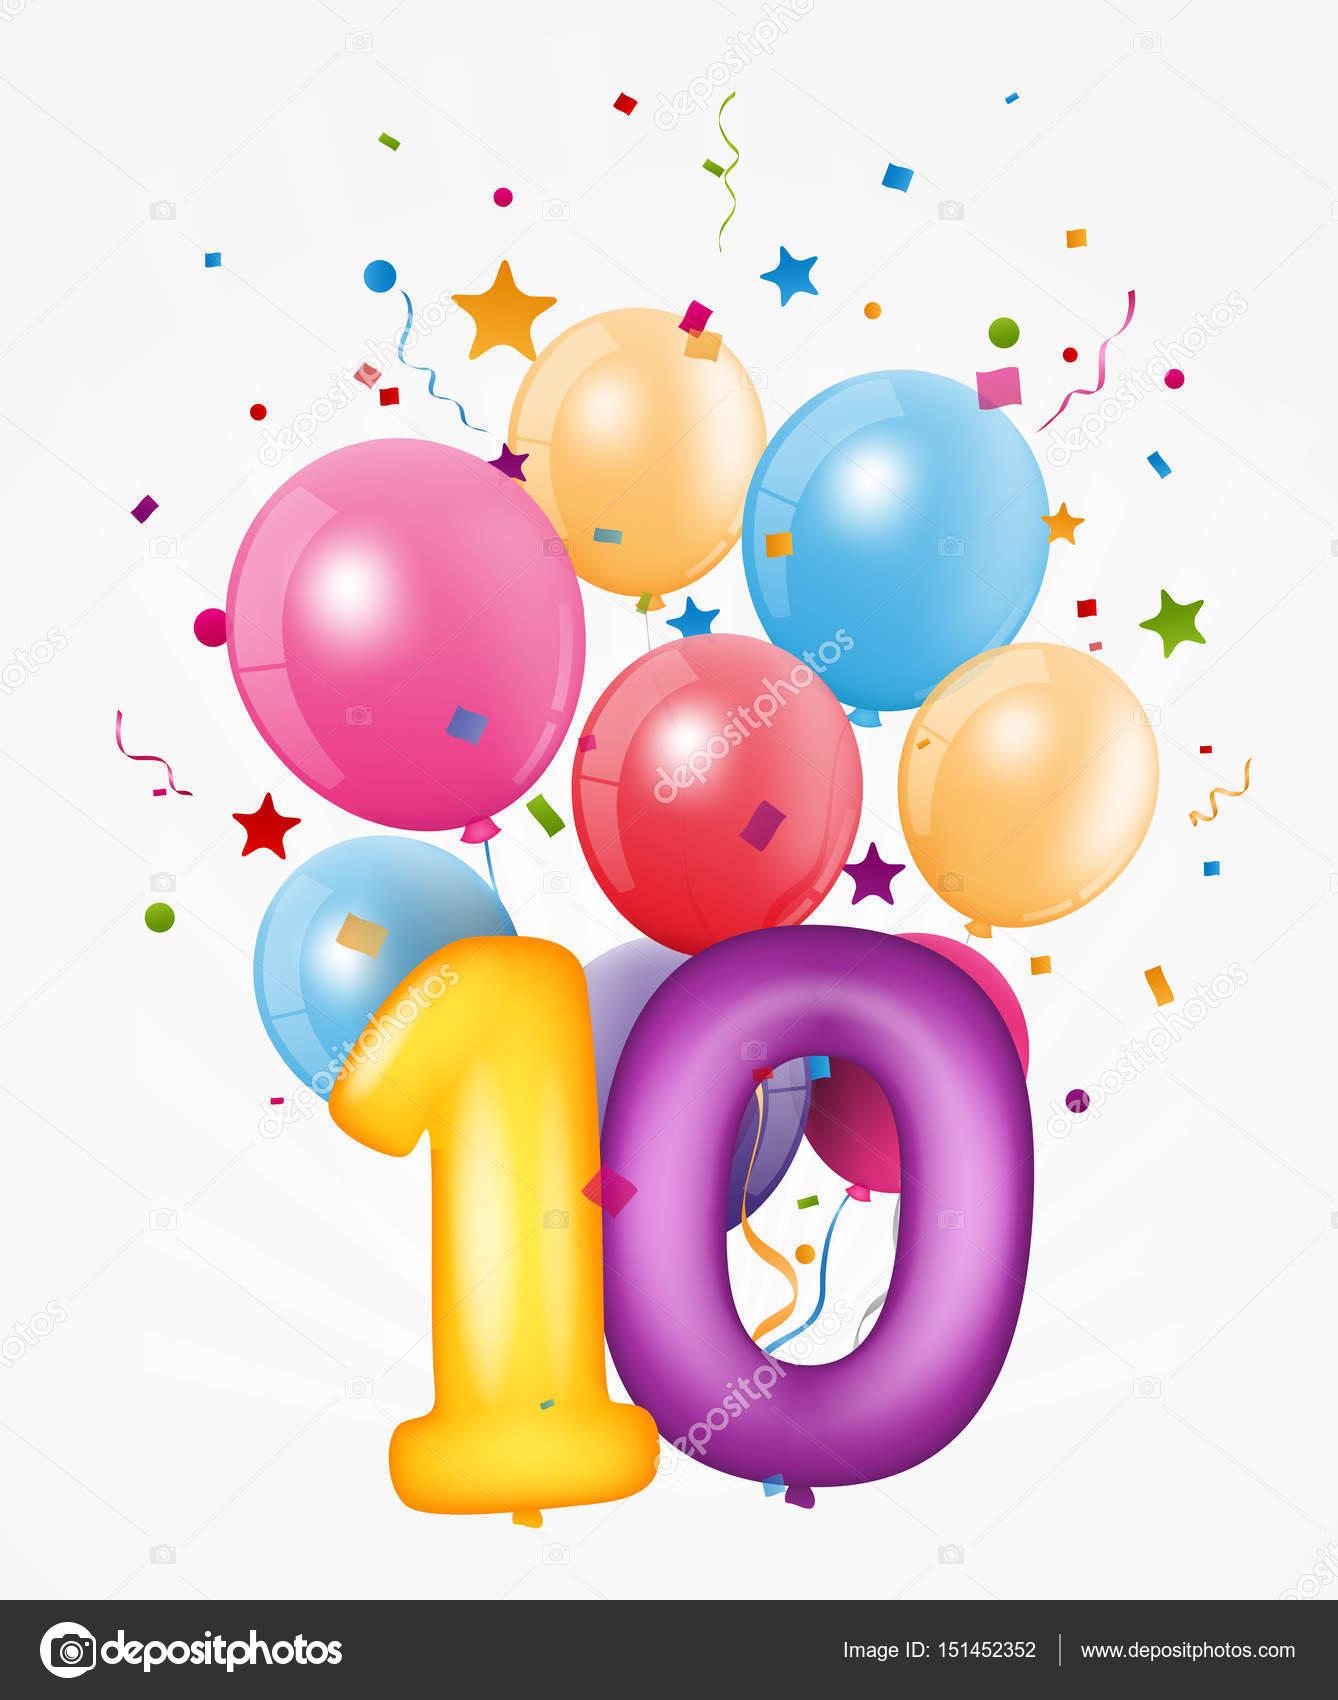 Happy birthday greeting card stock vector bejotrus 151452352 happy birthday greeting card stock vector m4hsunfo